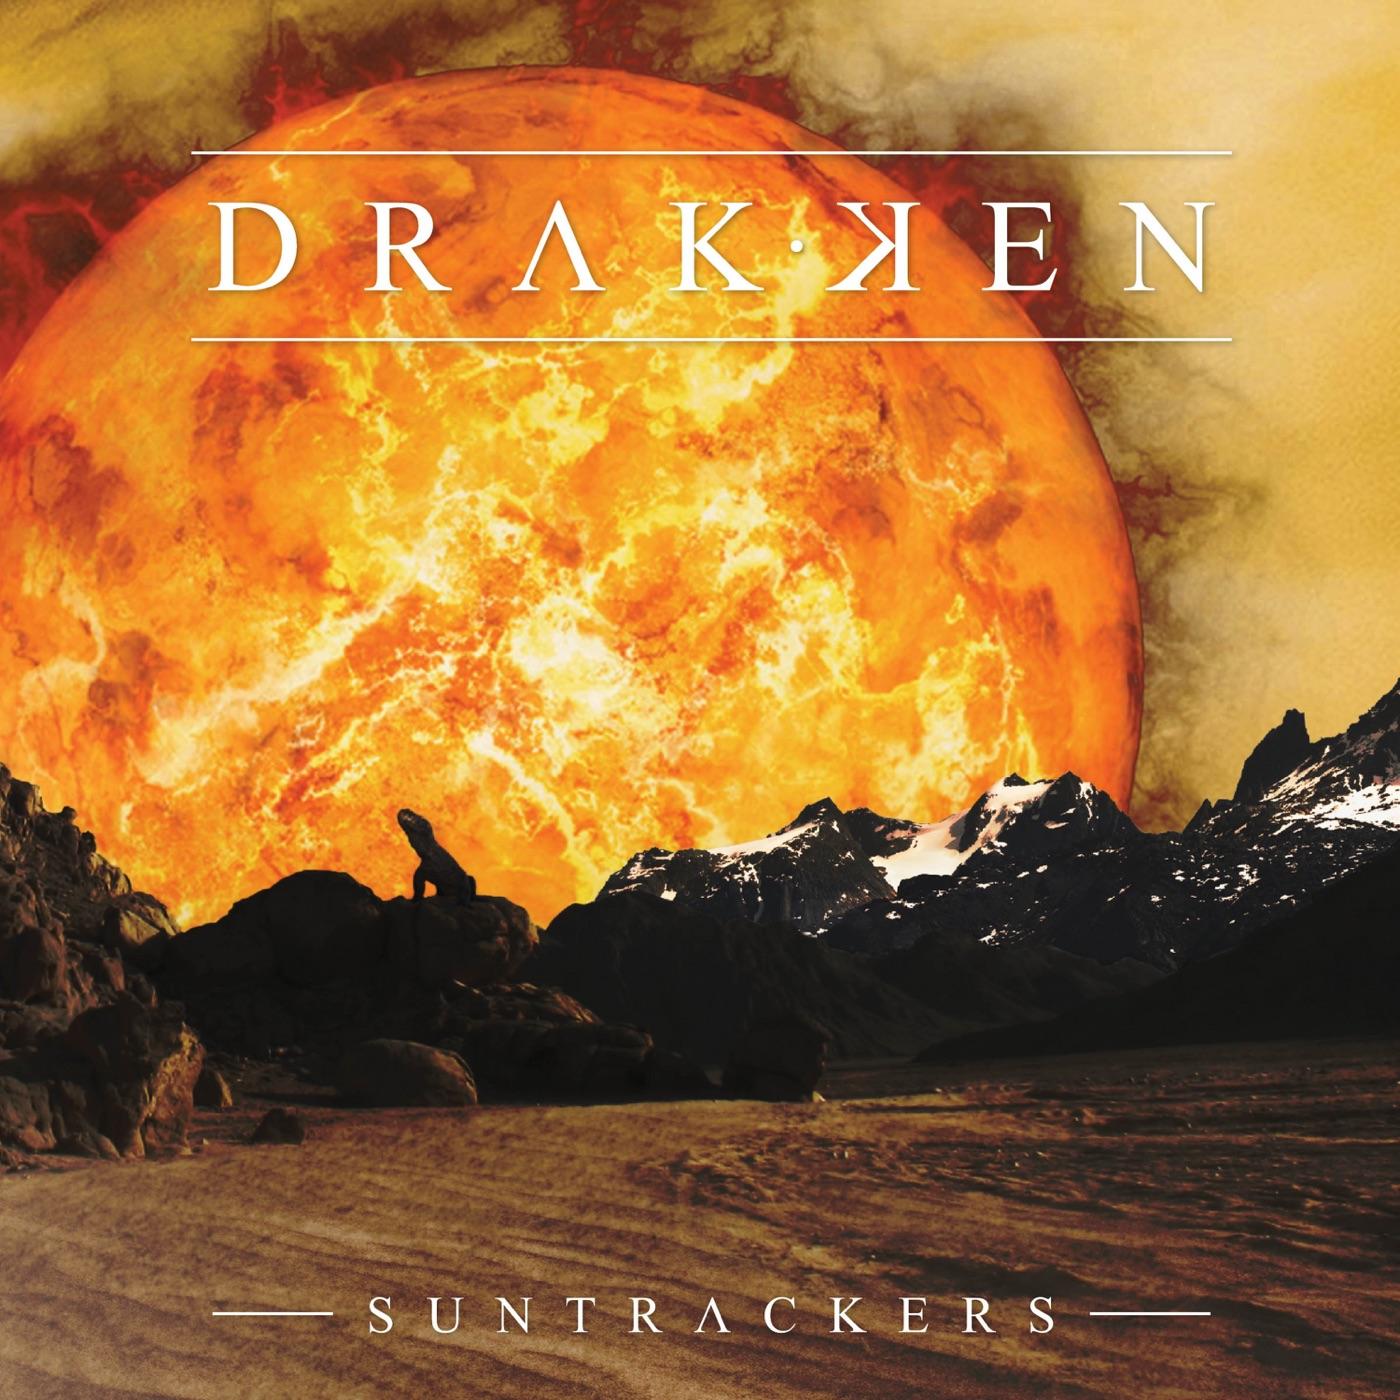 Drakken - Suntrackers (2019)